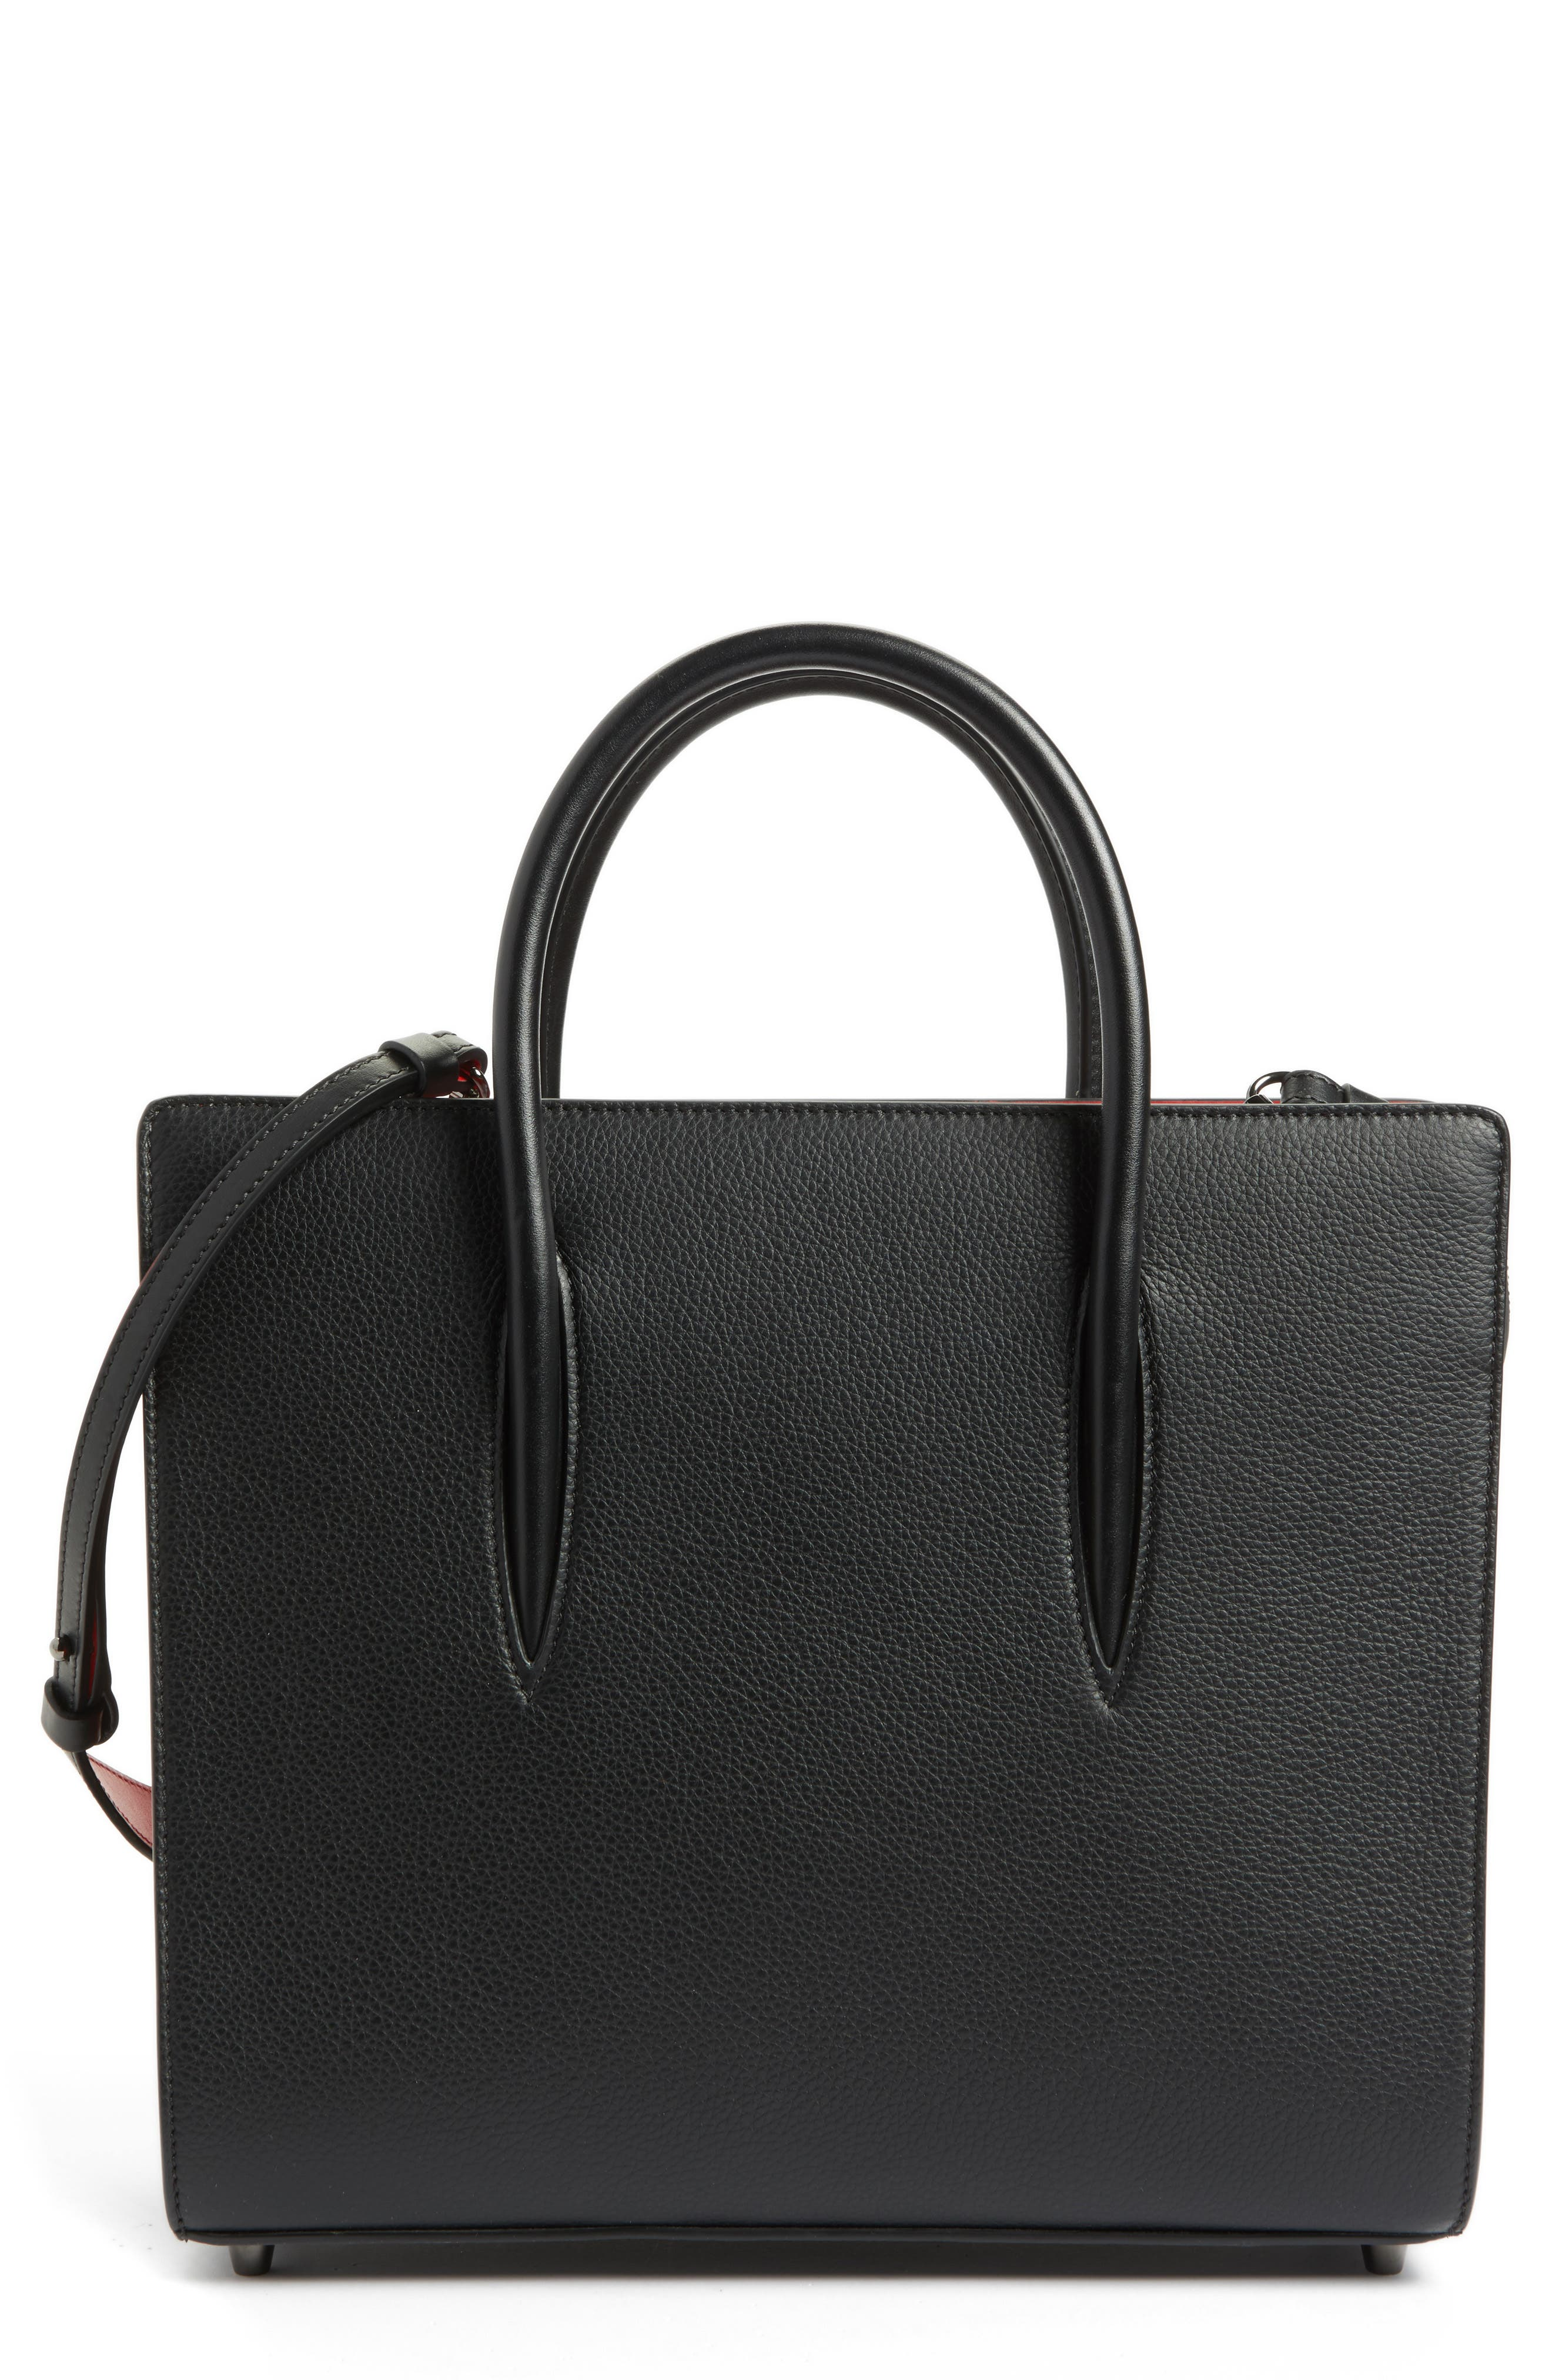 Alternate Image 1 Selected - Christian Louboutin Medium Paloma Leather Tote